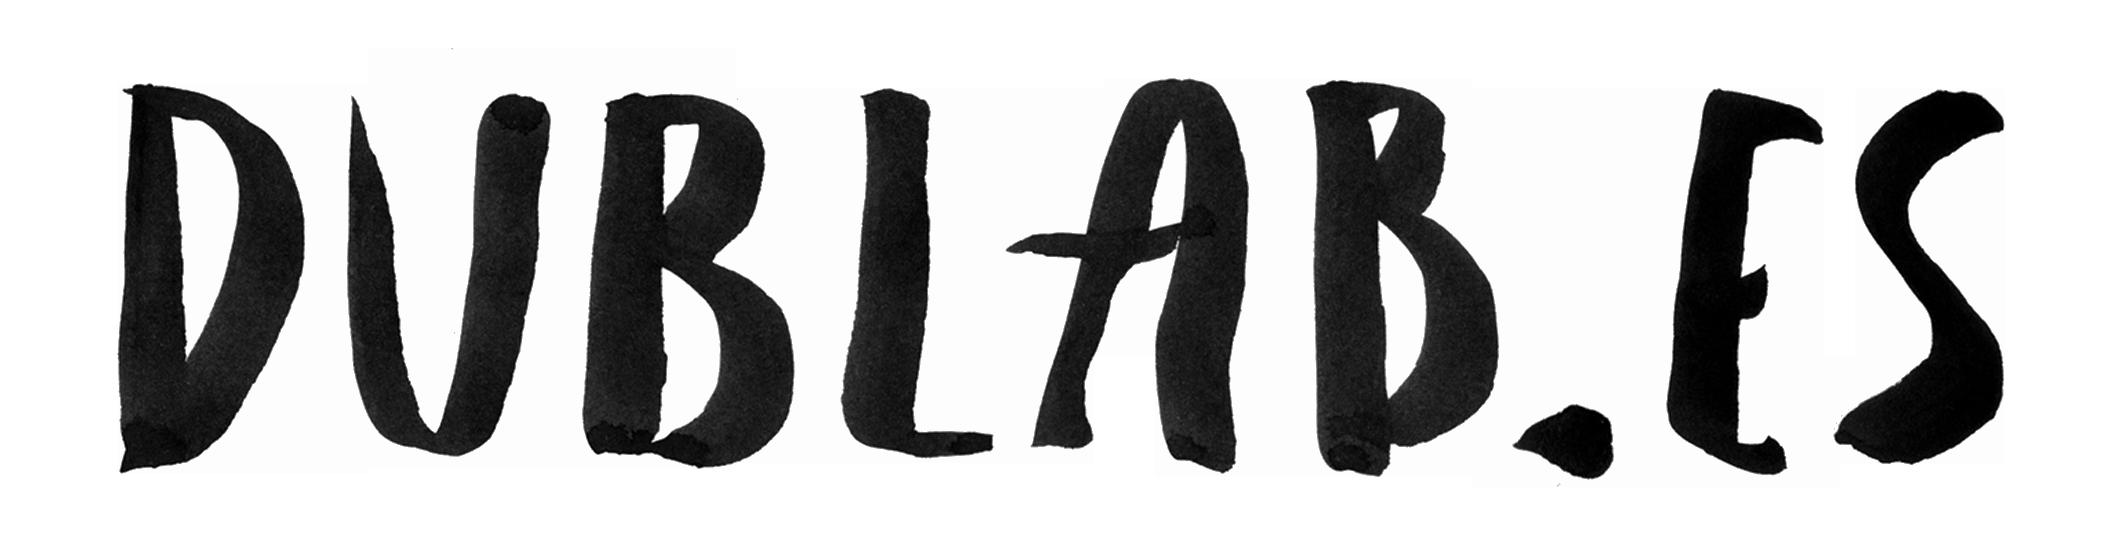 letras_logo.png